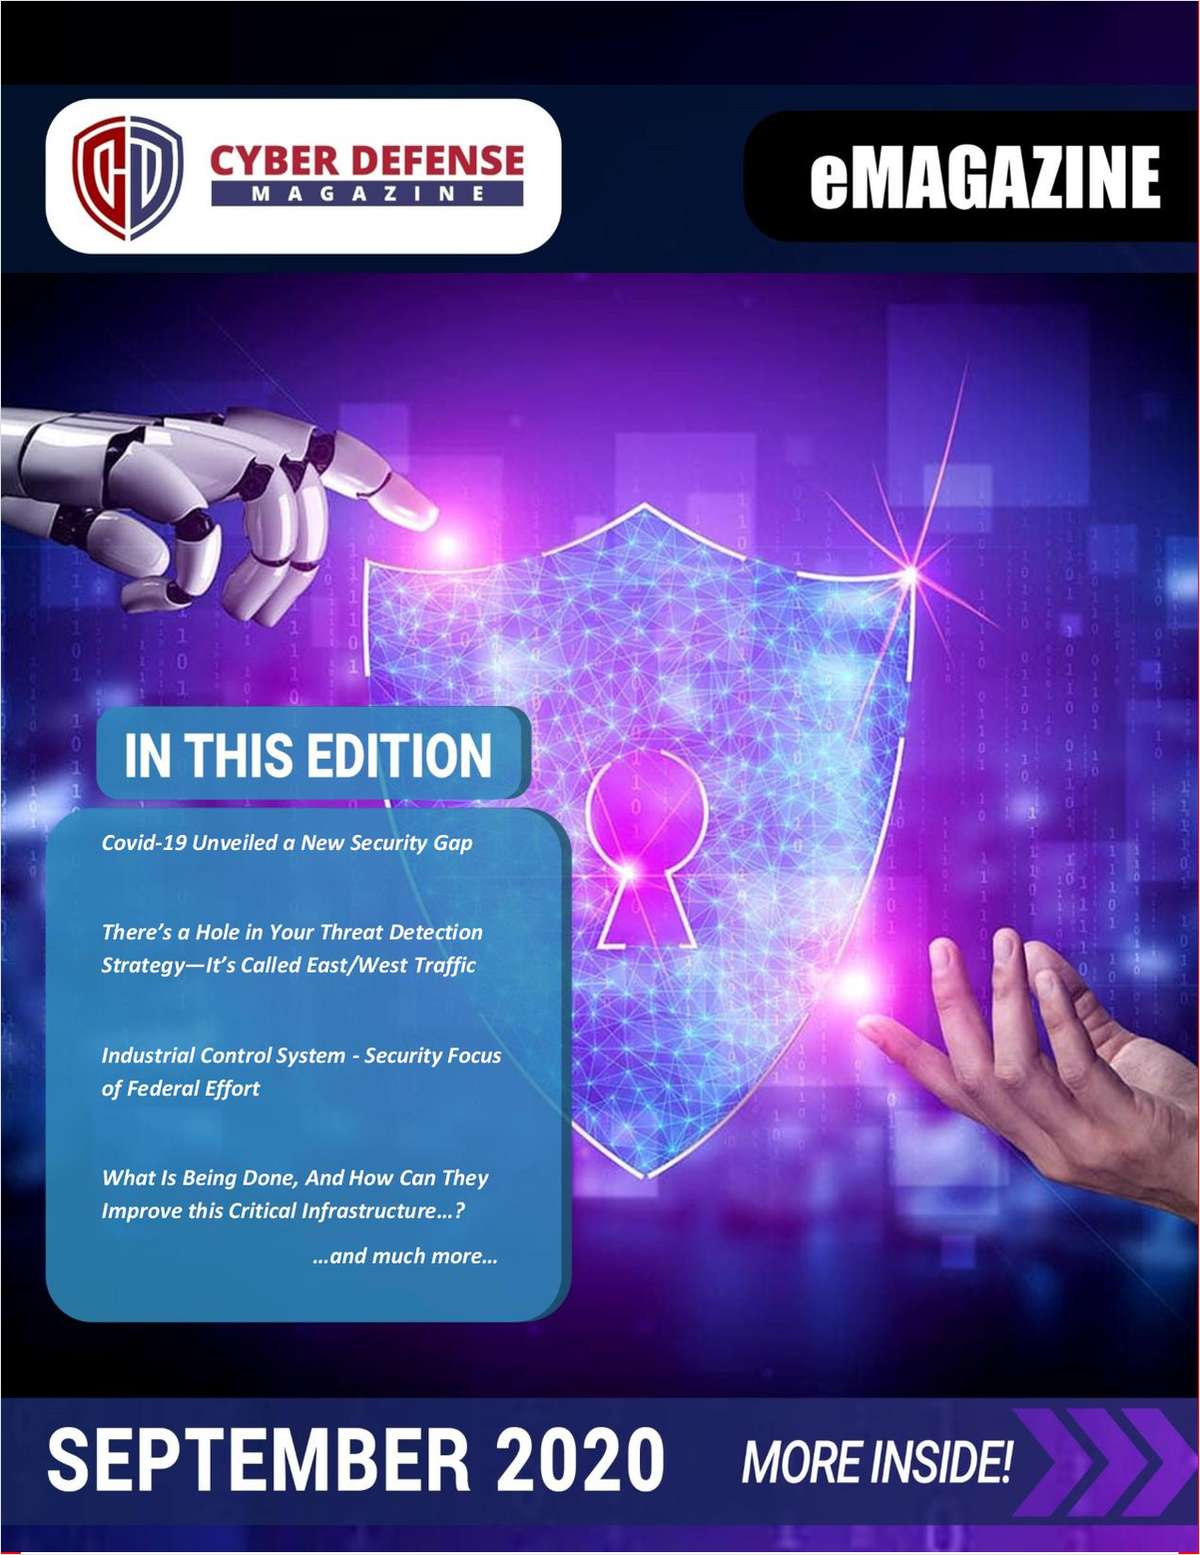 Cyber Defense Magazine September 2020 Edition